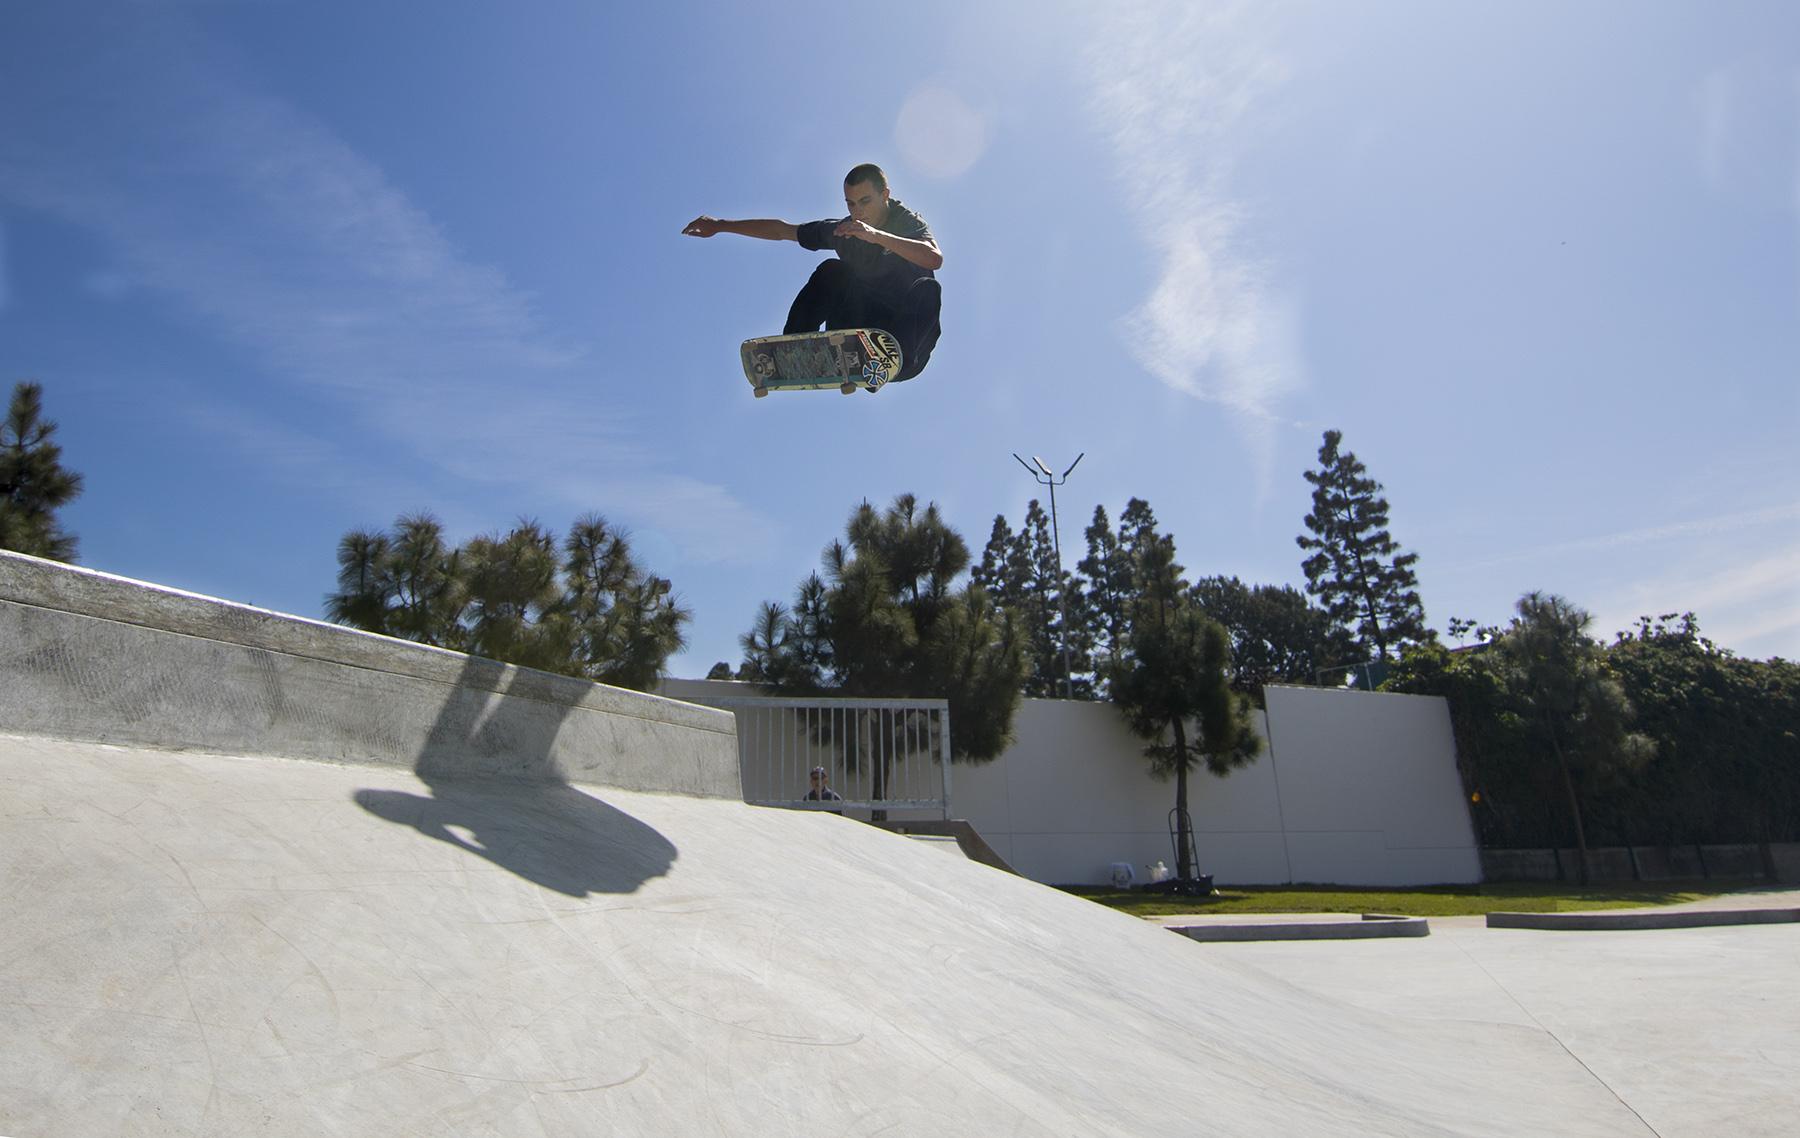 Manhattan Beach Skate Spot Gives Locals Skaters A Home (video)